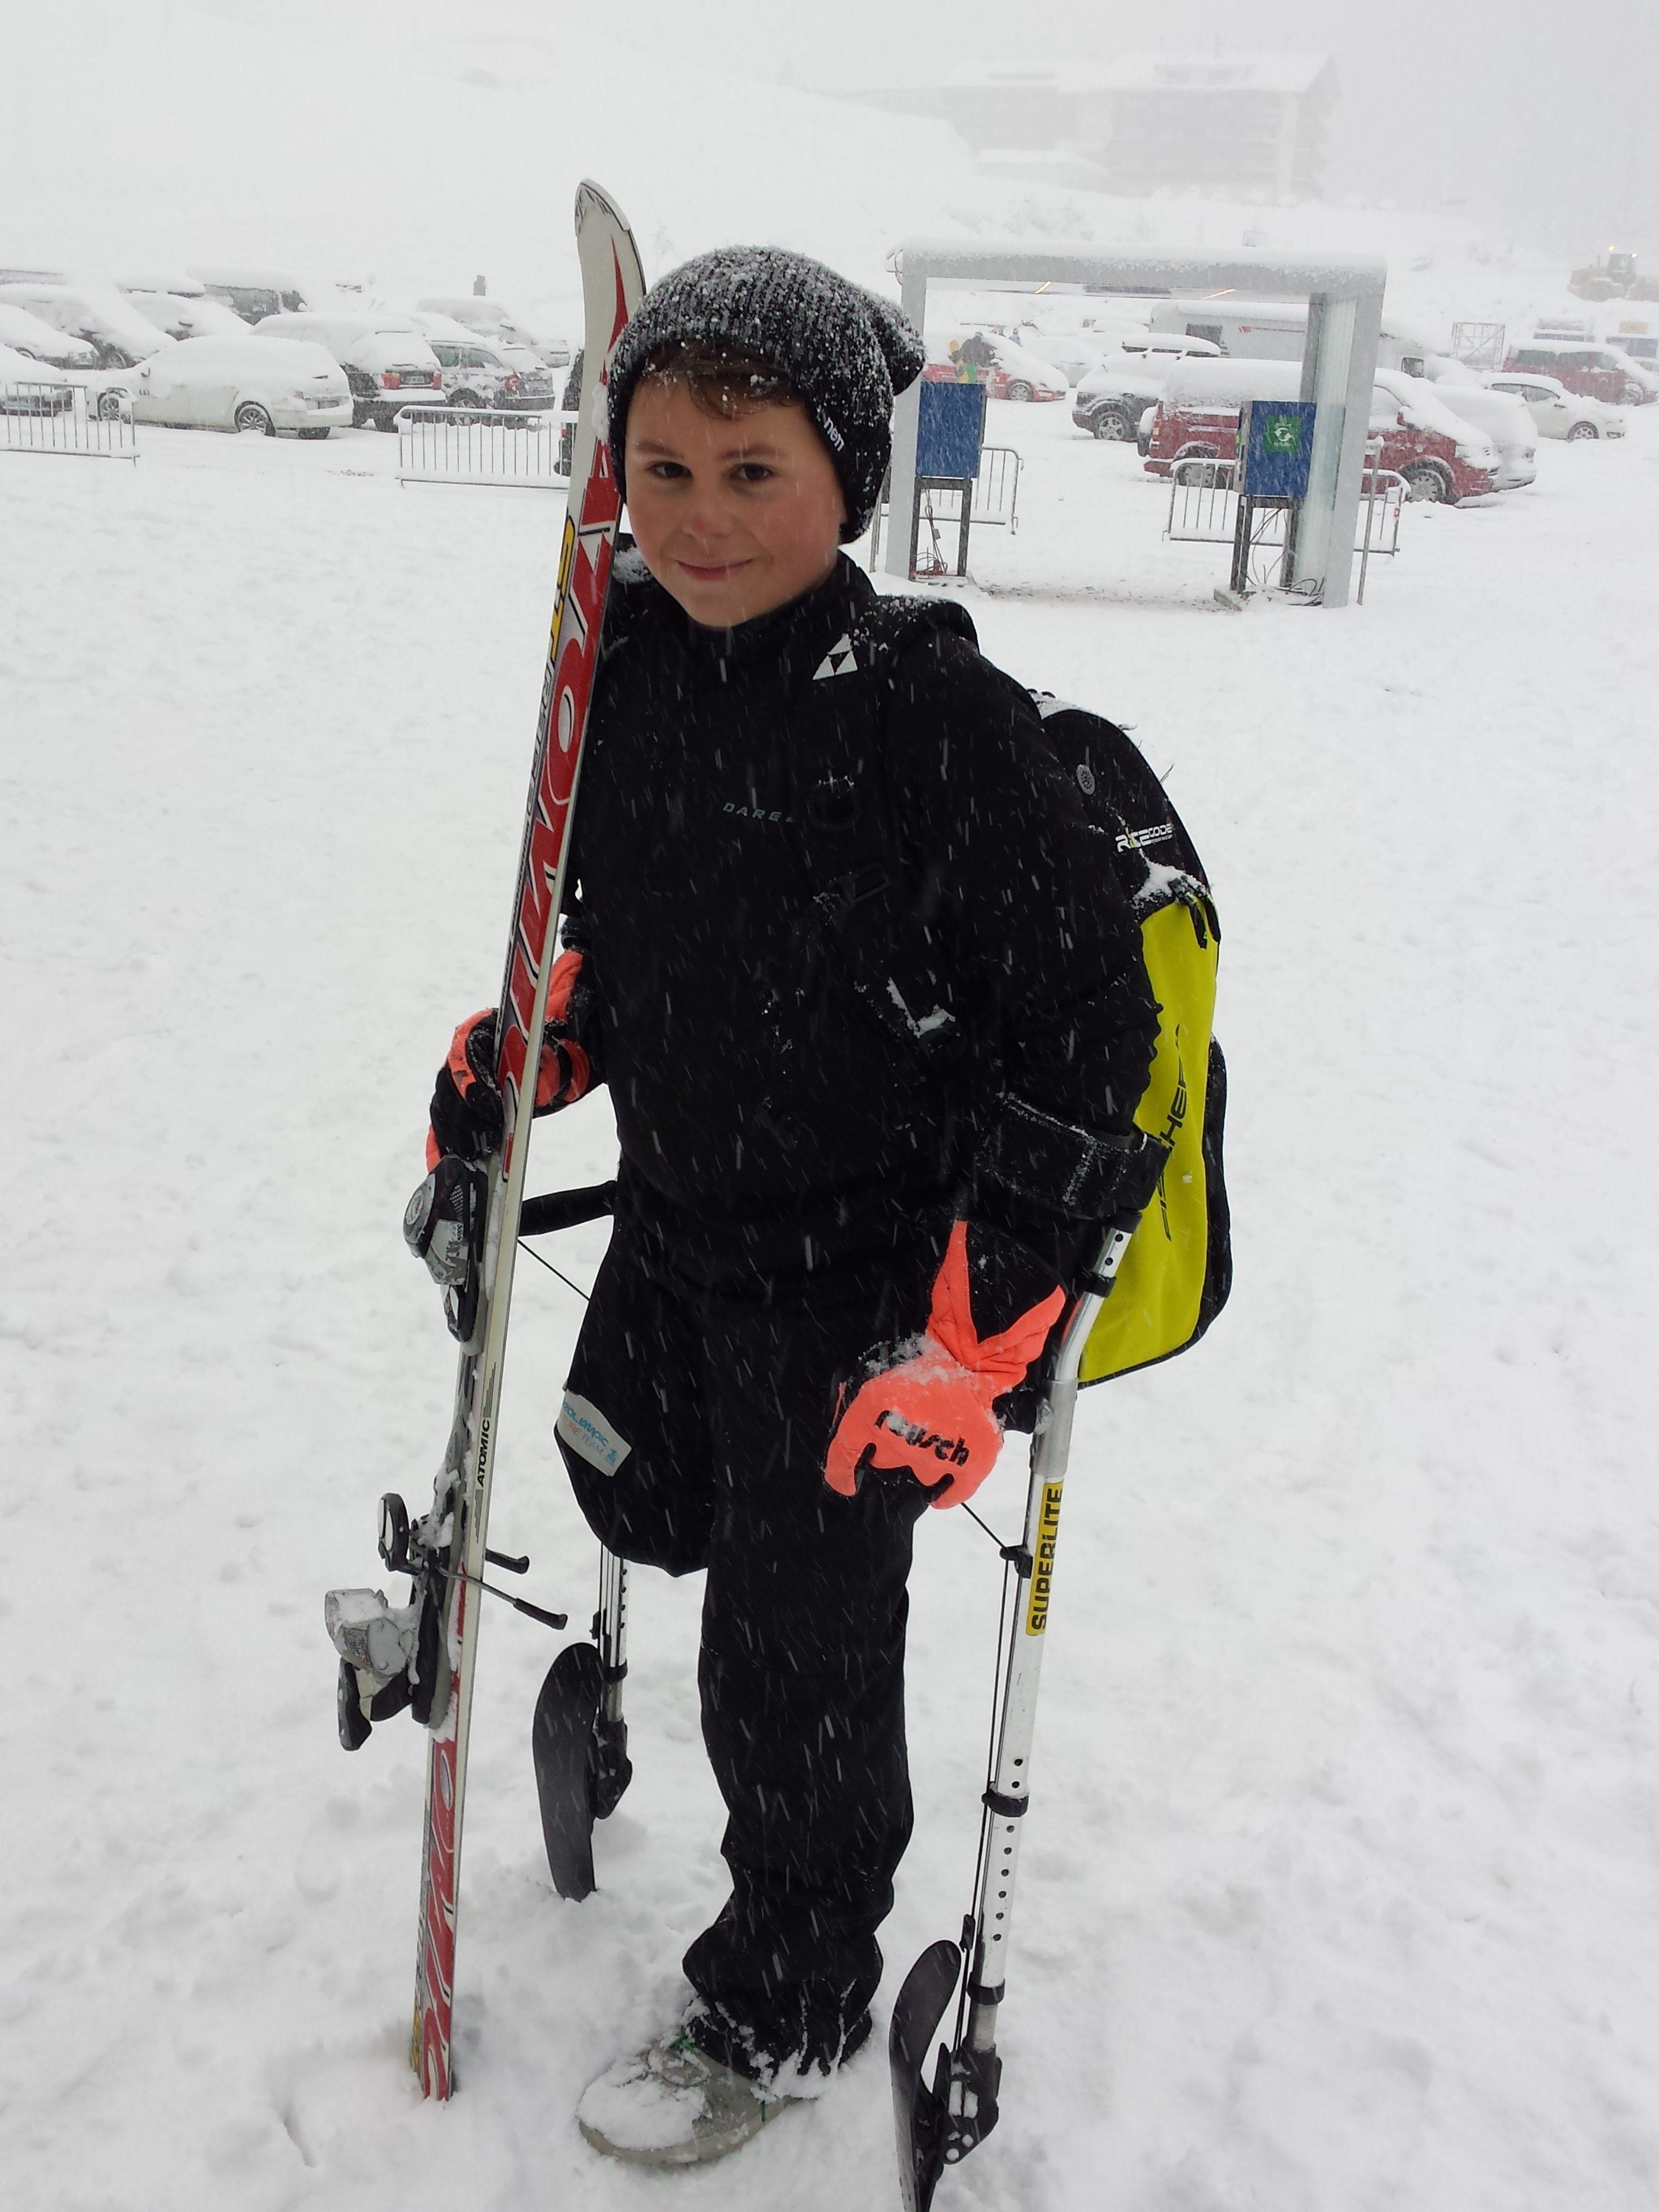 Skiing pro Christoph Glötzner